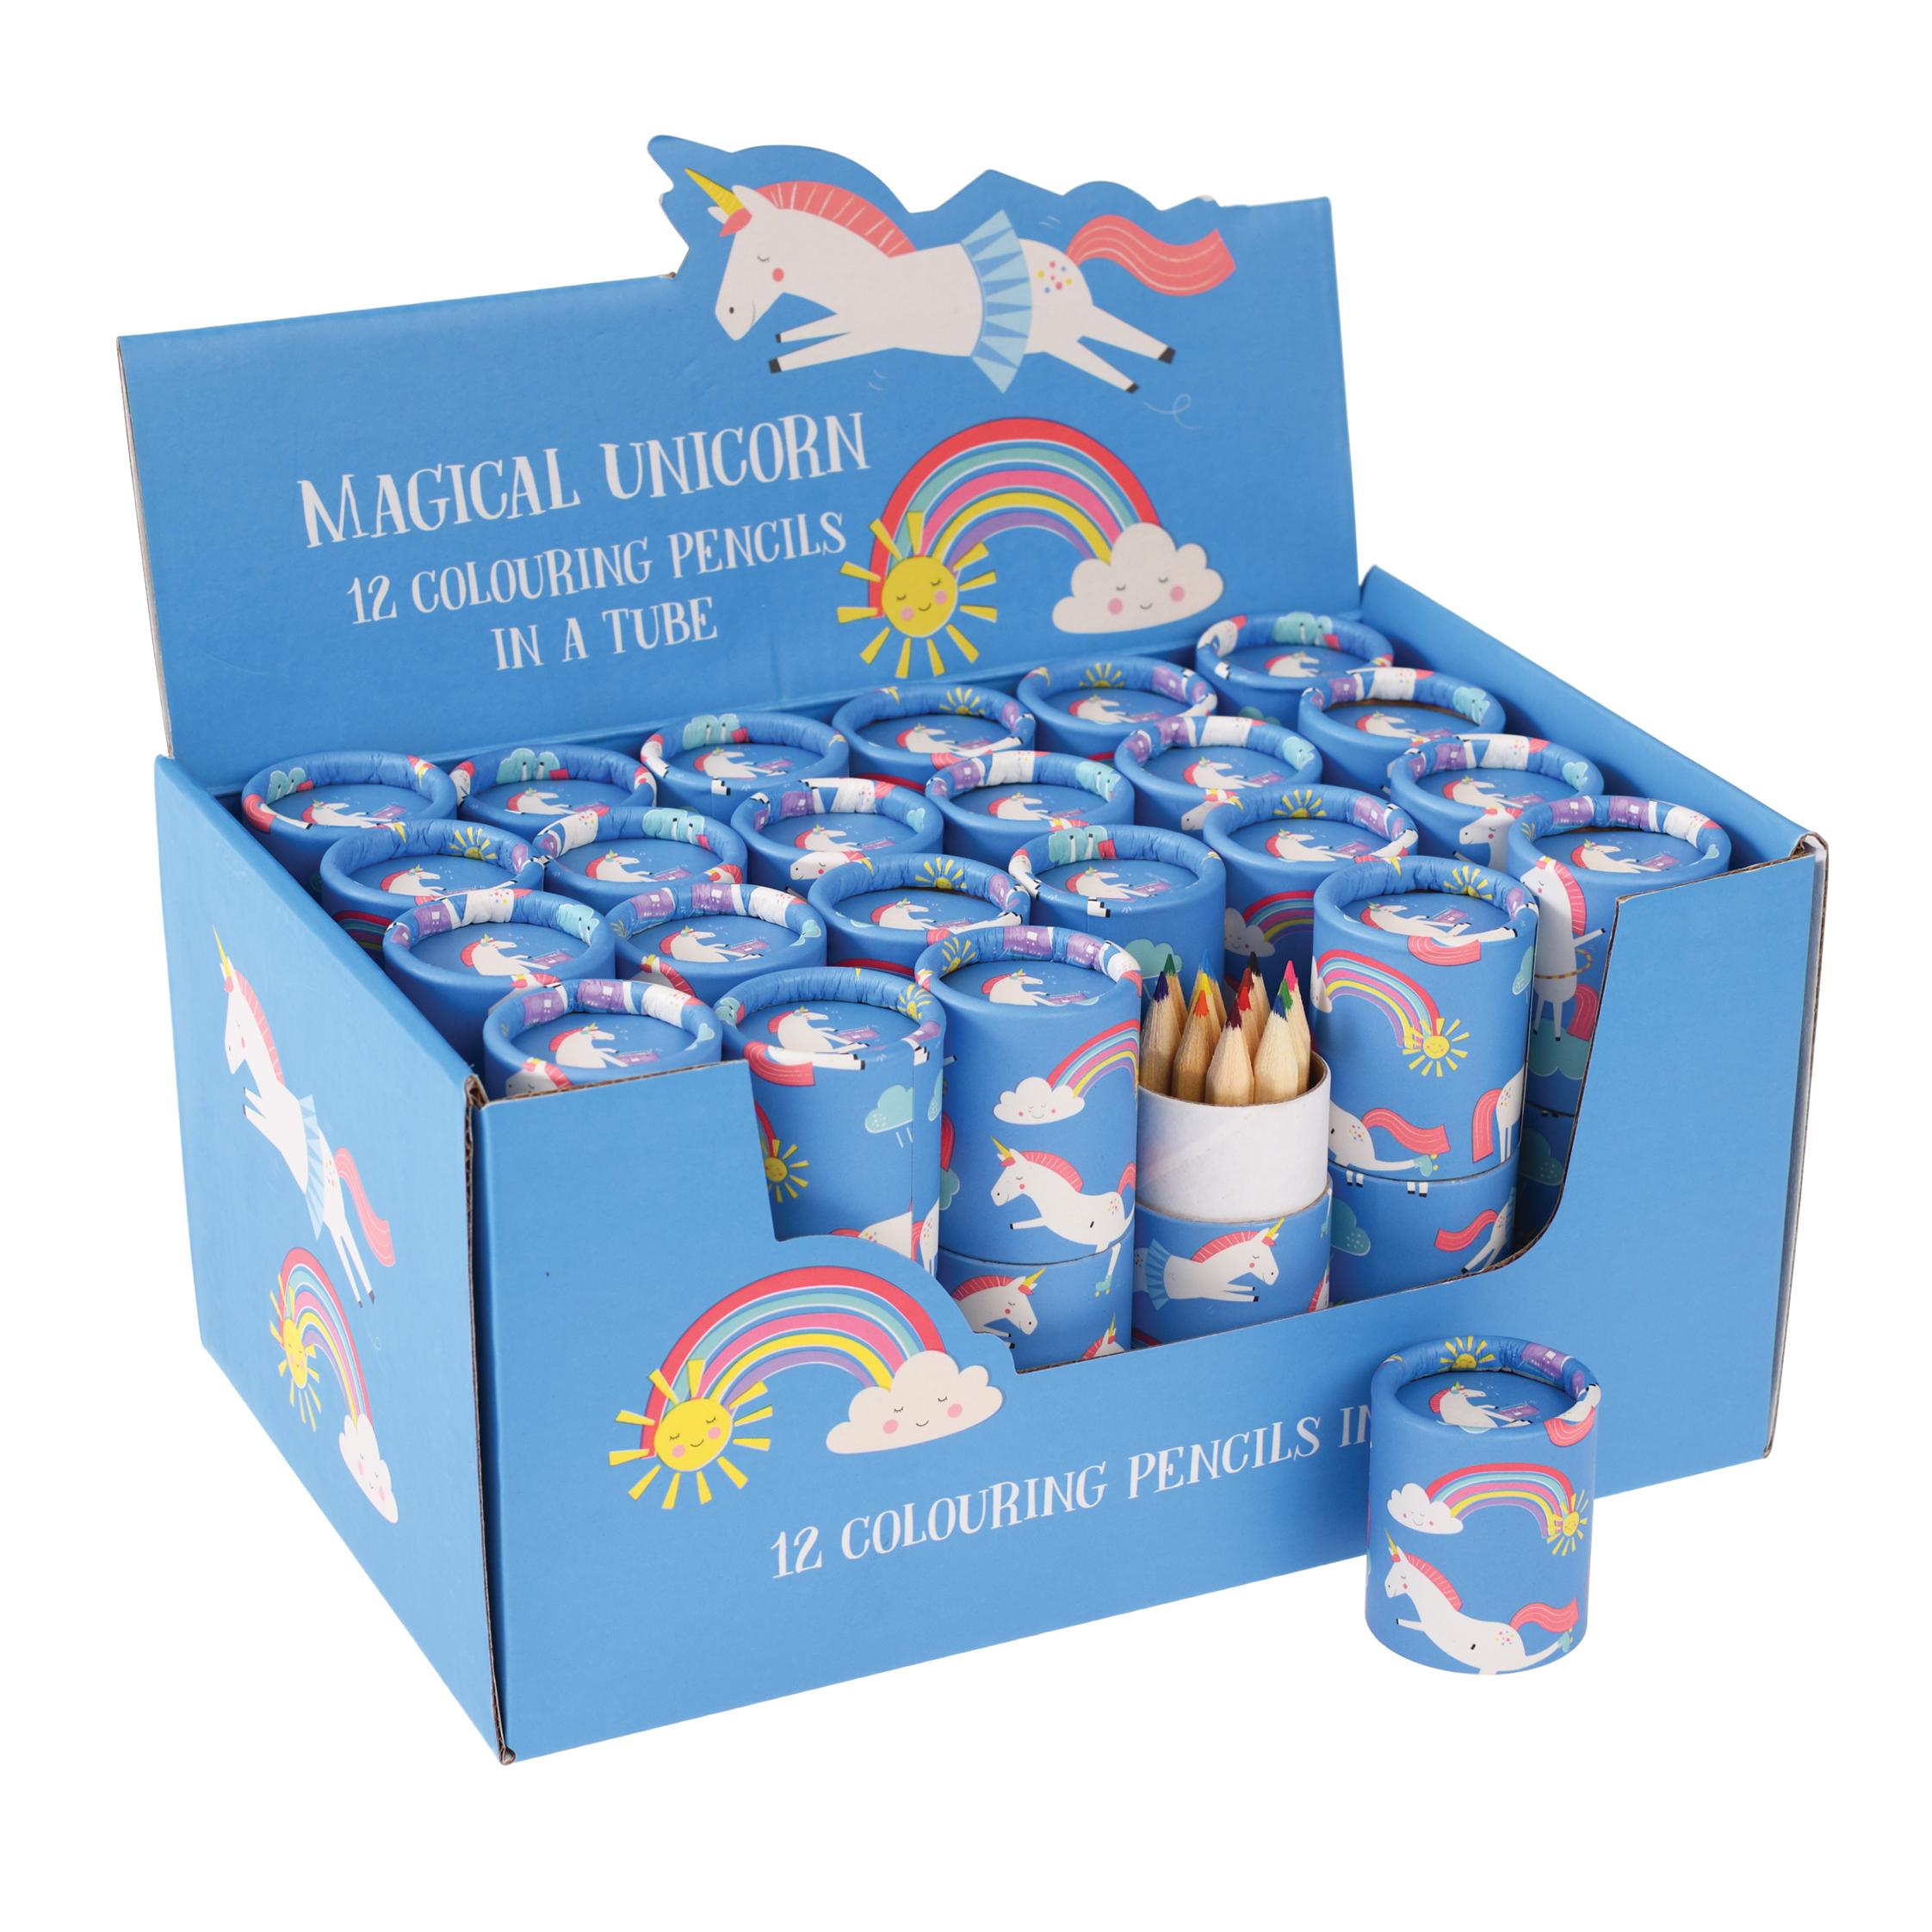 MAGICAL UNICORN COLOURING PENCILS (SET OF 12)